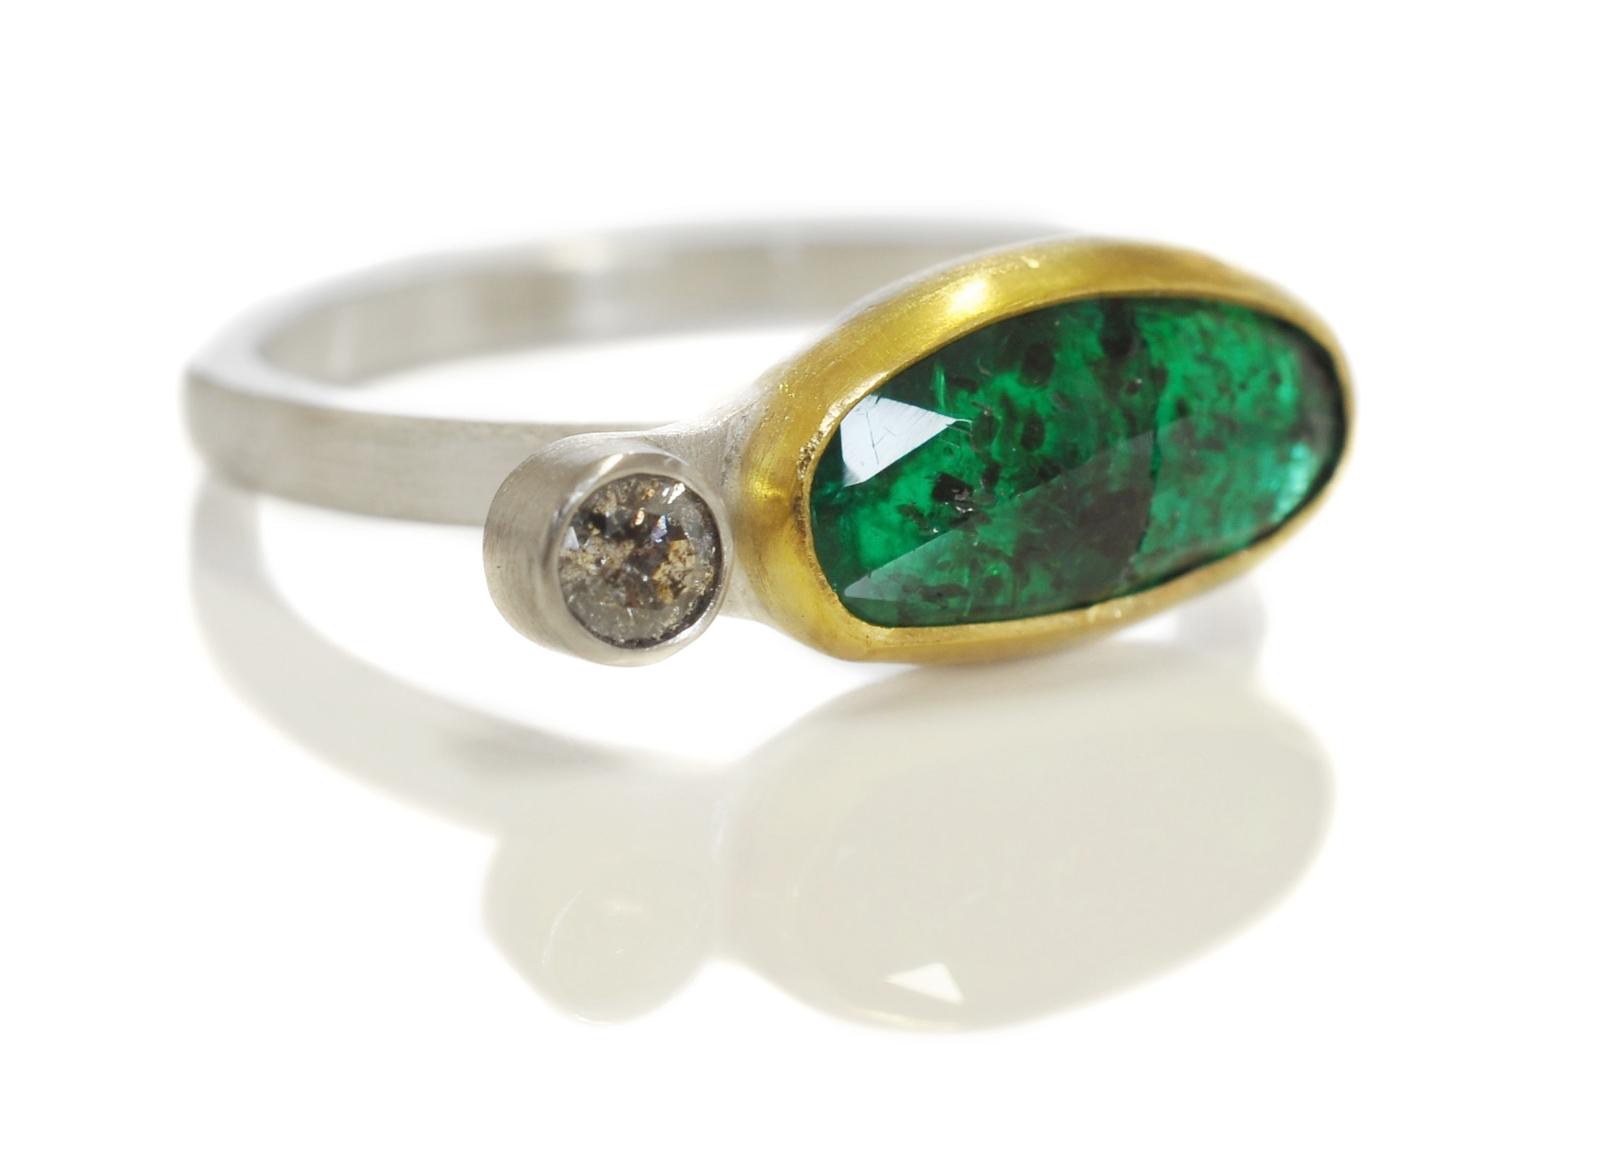 louisa-custom-double-gem-ring-rosecut-emerald-gray-diamond-18ky-bezel-14kw-silver-band-side.jpg